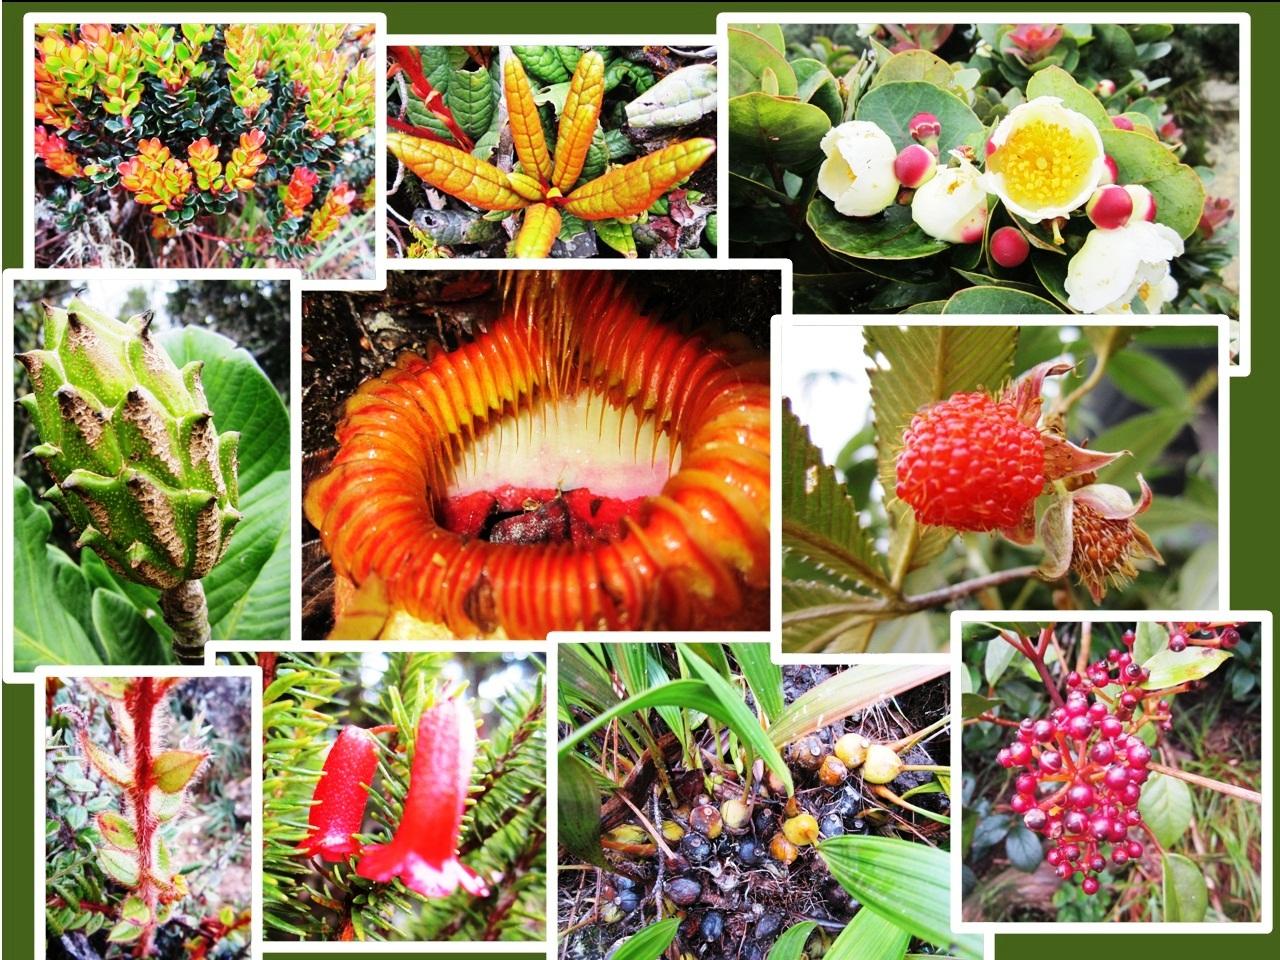 The flora of Mt. Kinabalu, mt kinabalu plants, mt kinabalu flowers, mt kinabalu trail, mt kinabalu itinerary, kota kinabalu plants, mt kinabalu pitcher plant, pitcher plant kota kinabalu, mt kinabalu pitcher plant, pitcher plant kota kinabalu